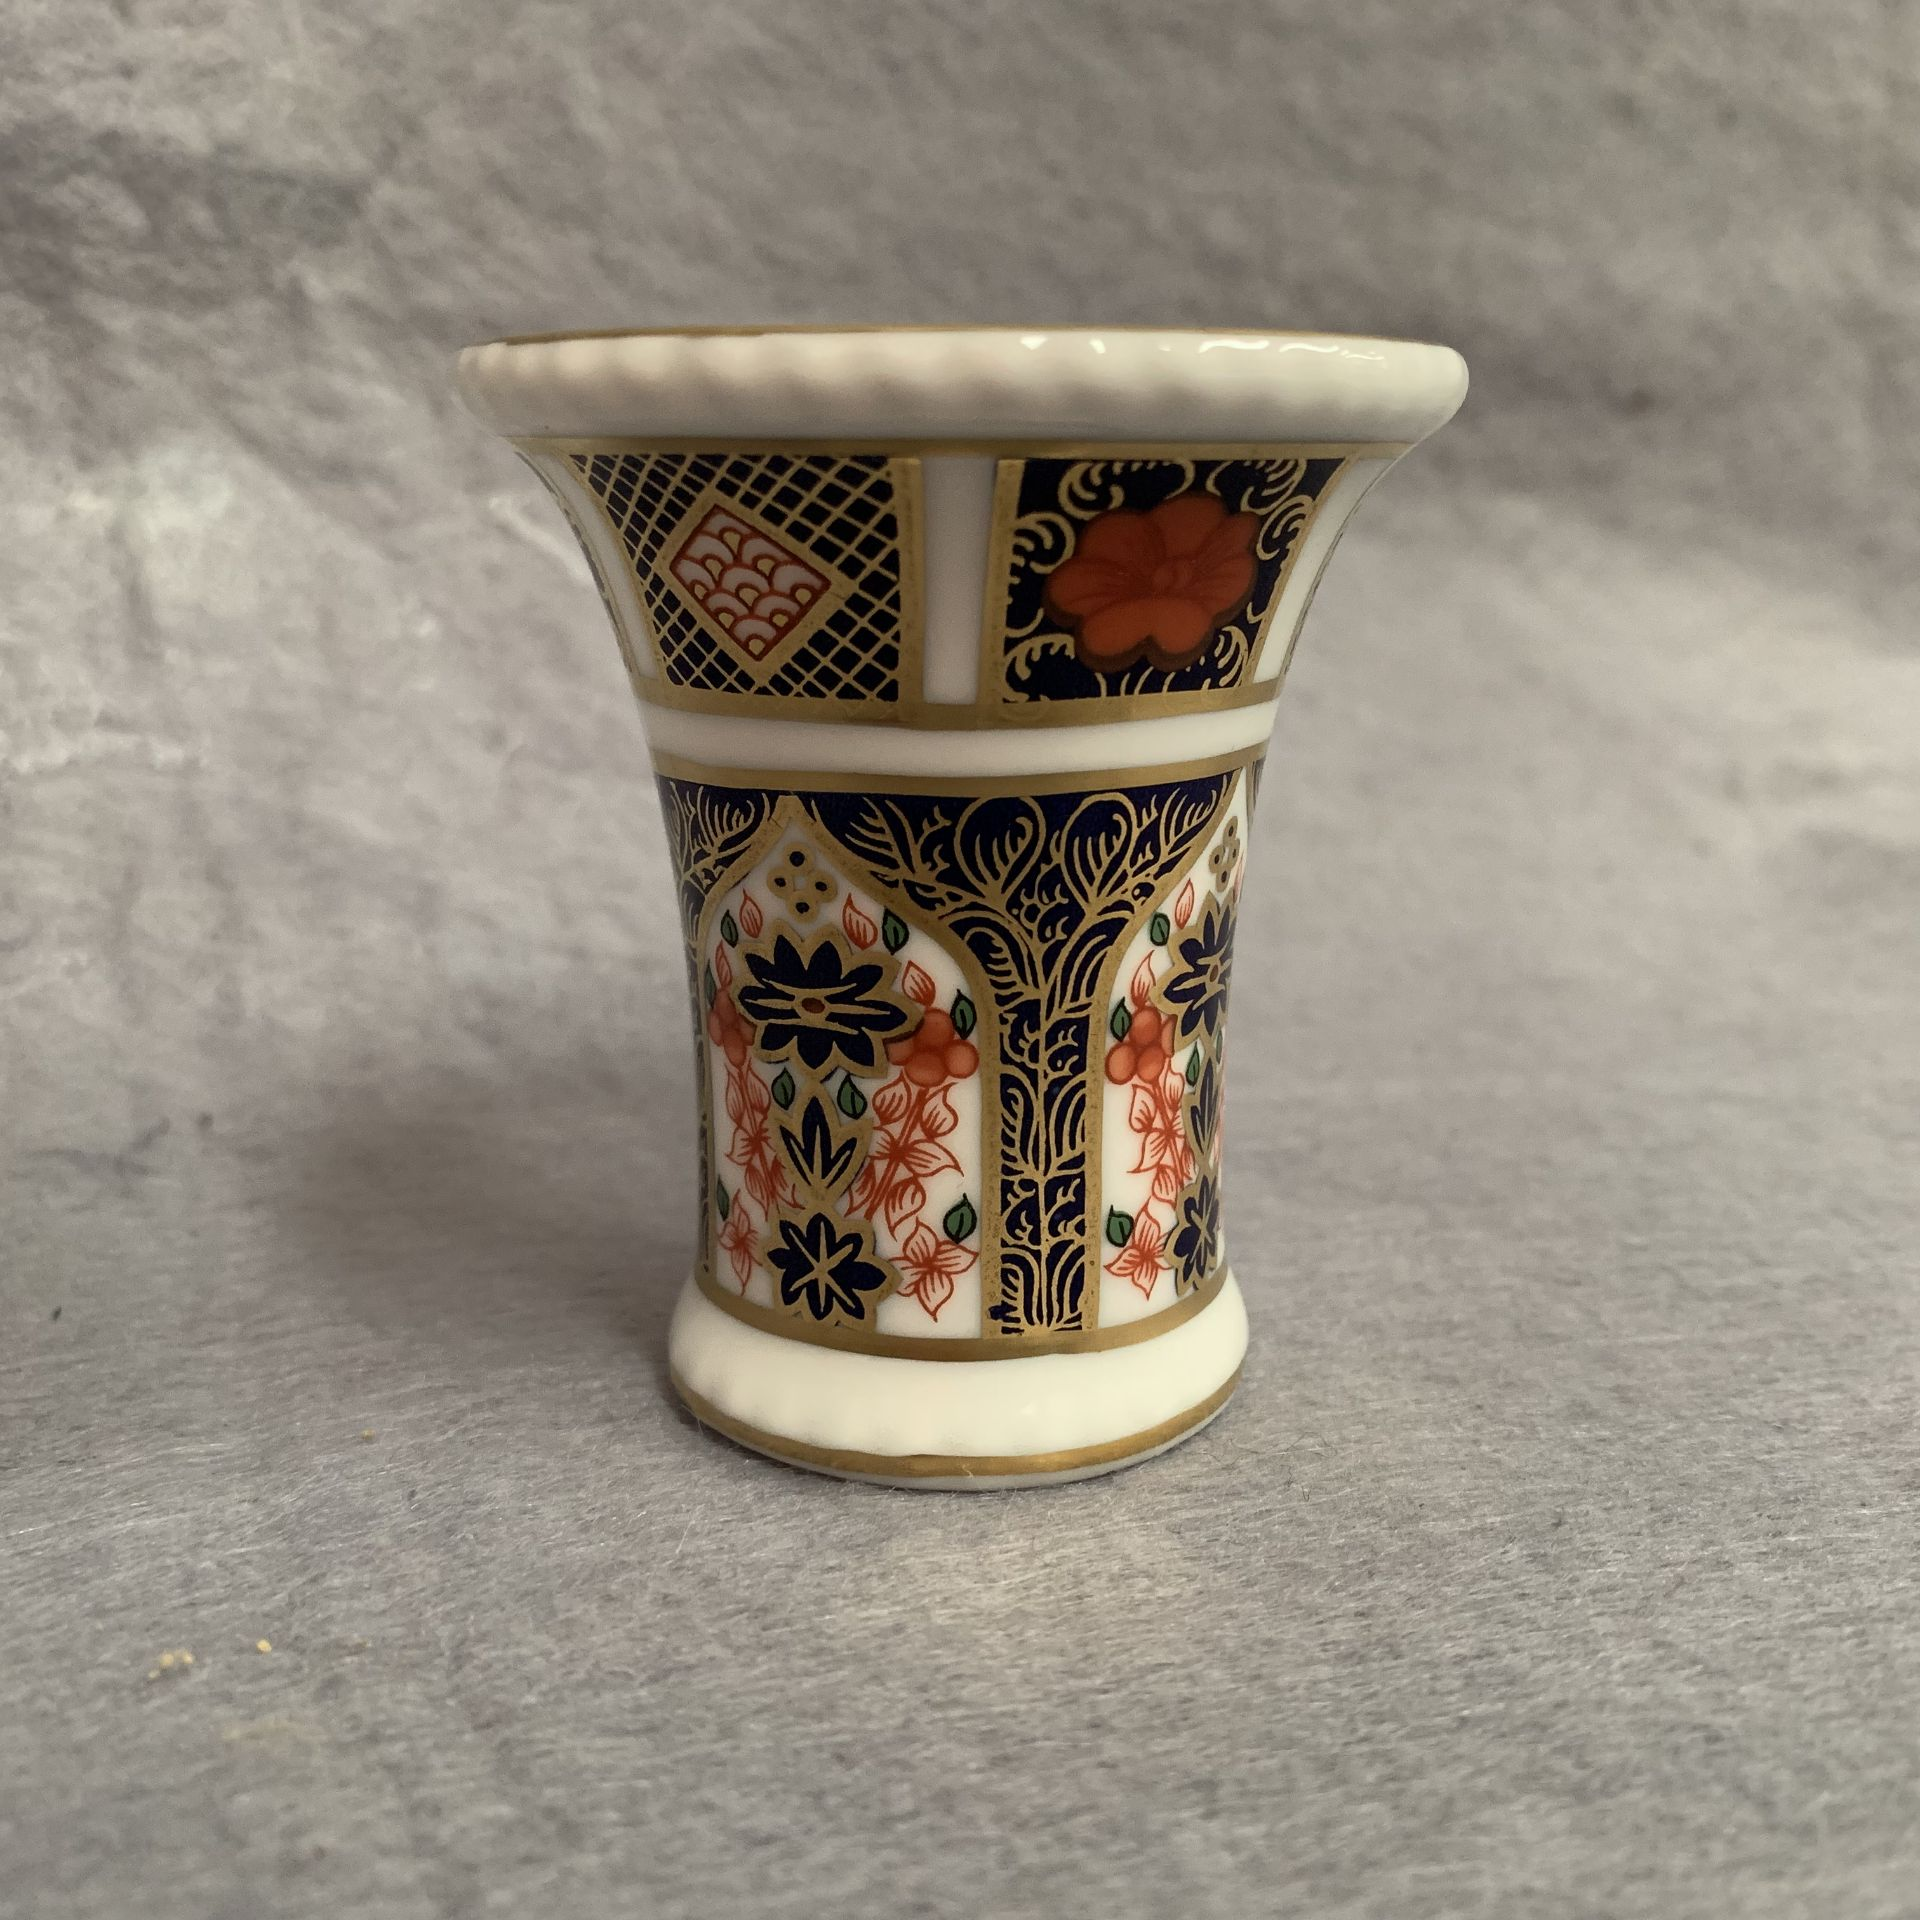 Lot 15 - Royal Crown Derby small vase (boxed) Old Imari pattern 1128 LIV